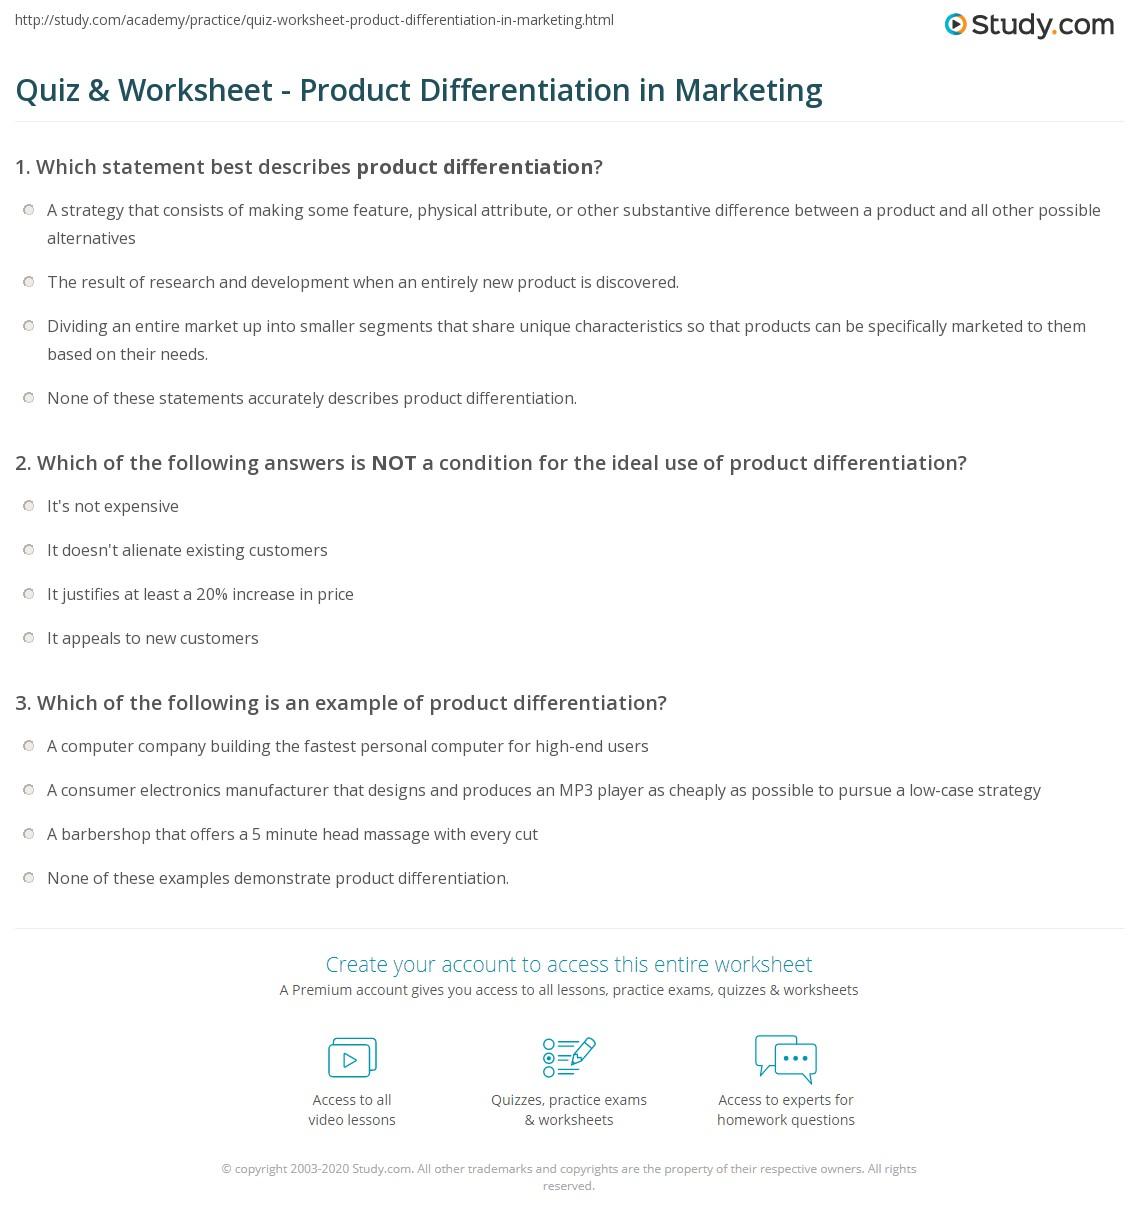 quiz worksheet product differentiation in marketing. Black Bedroom Furniture Sets. Home Design Ideas